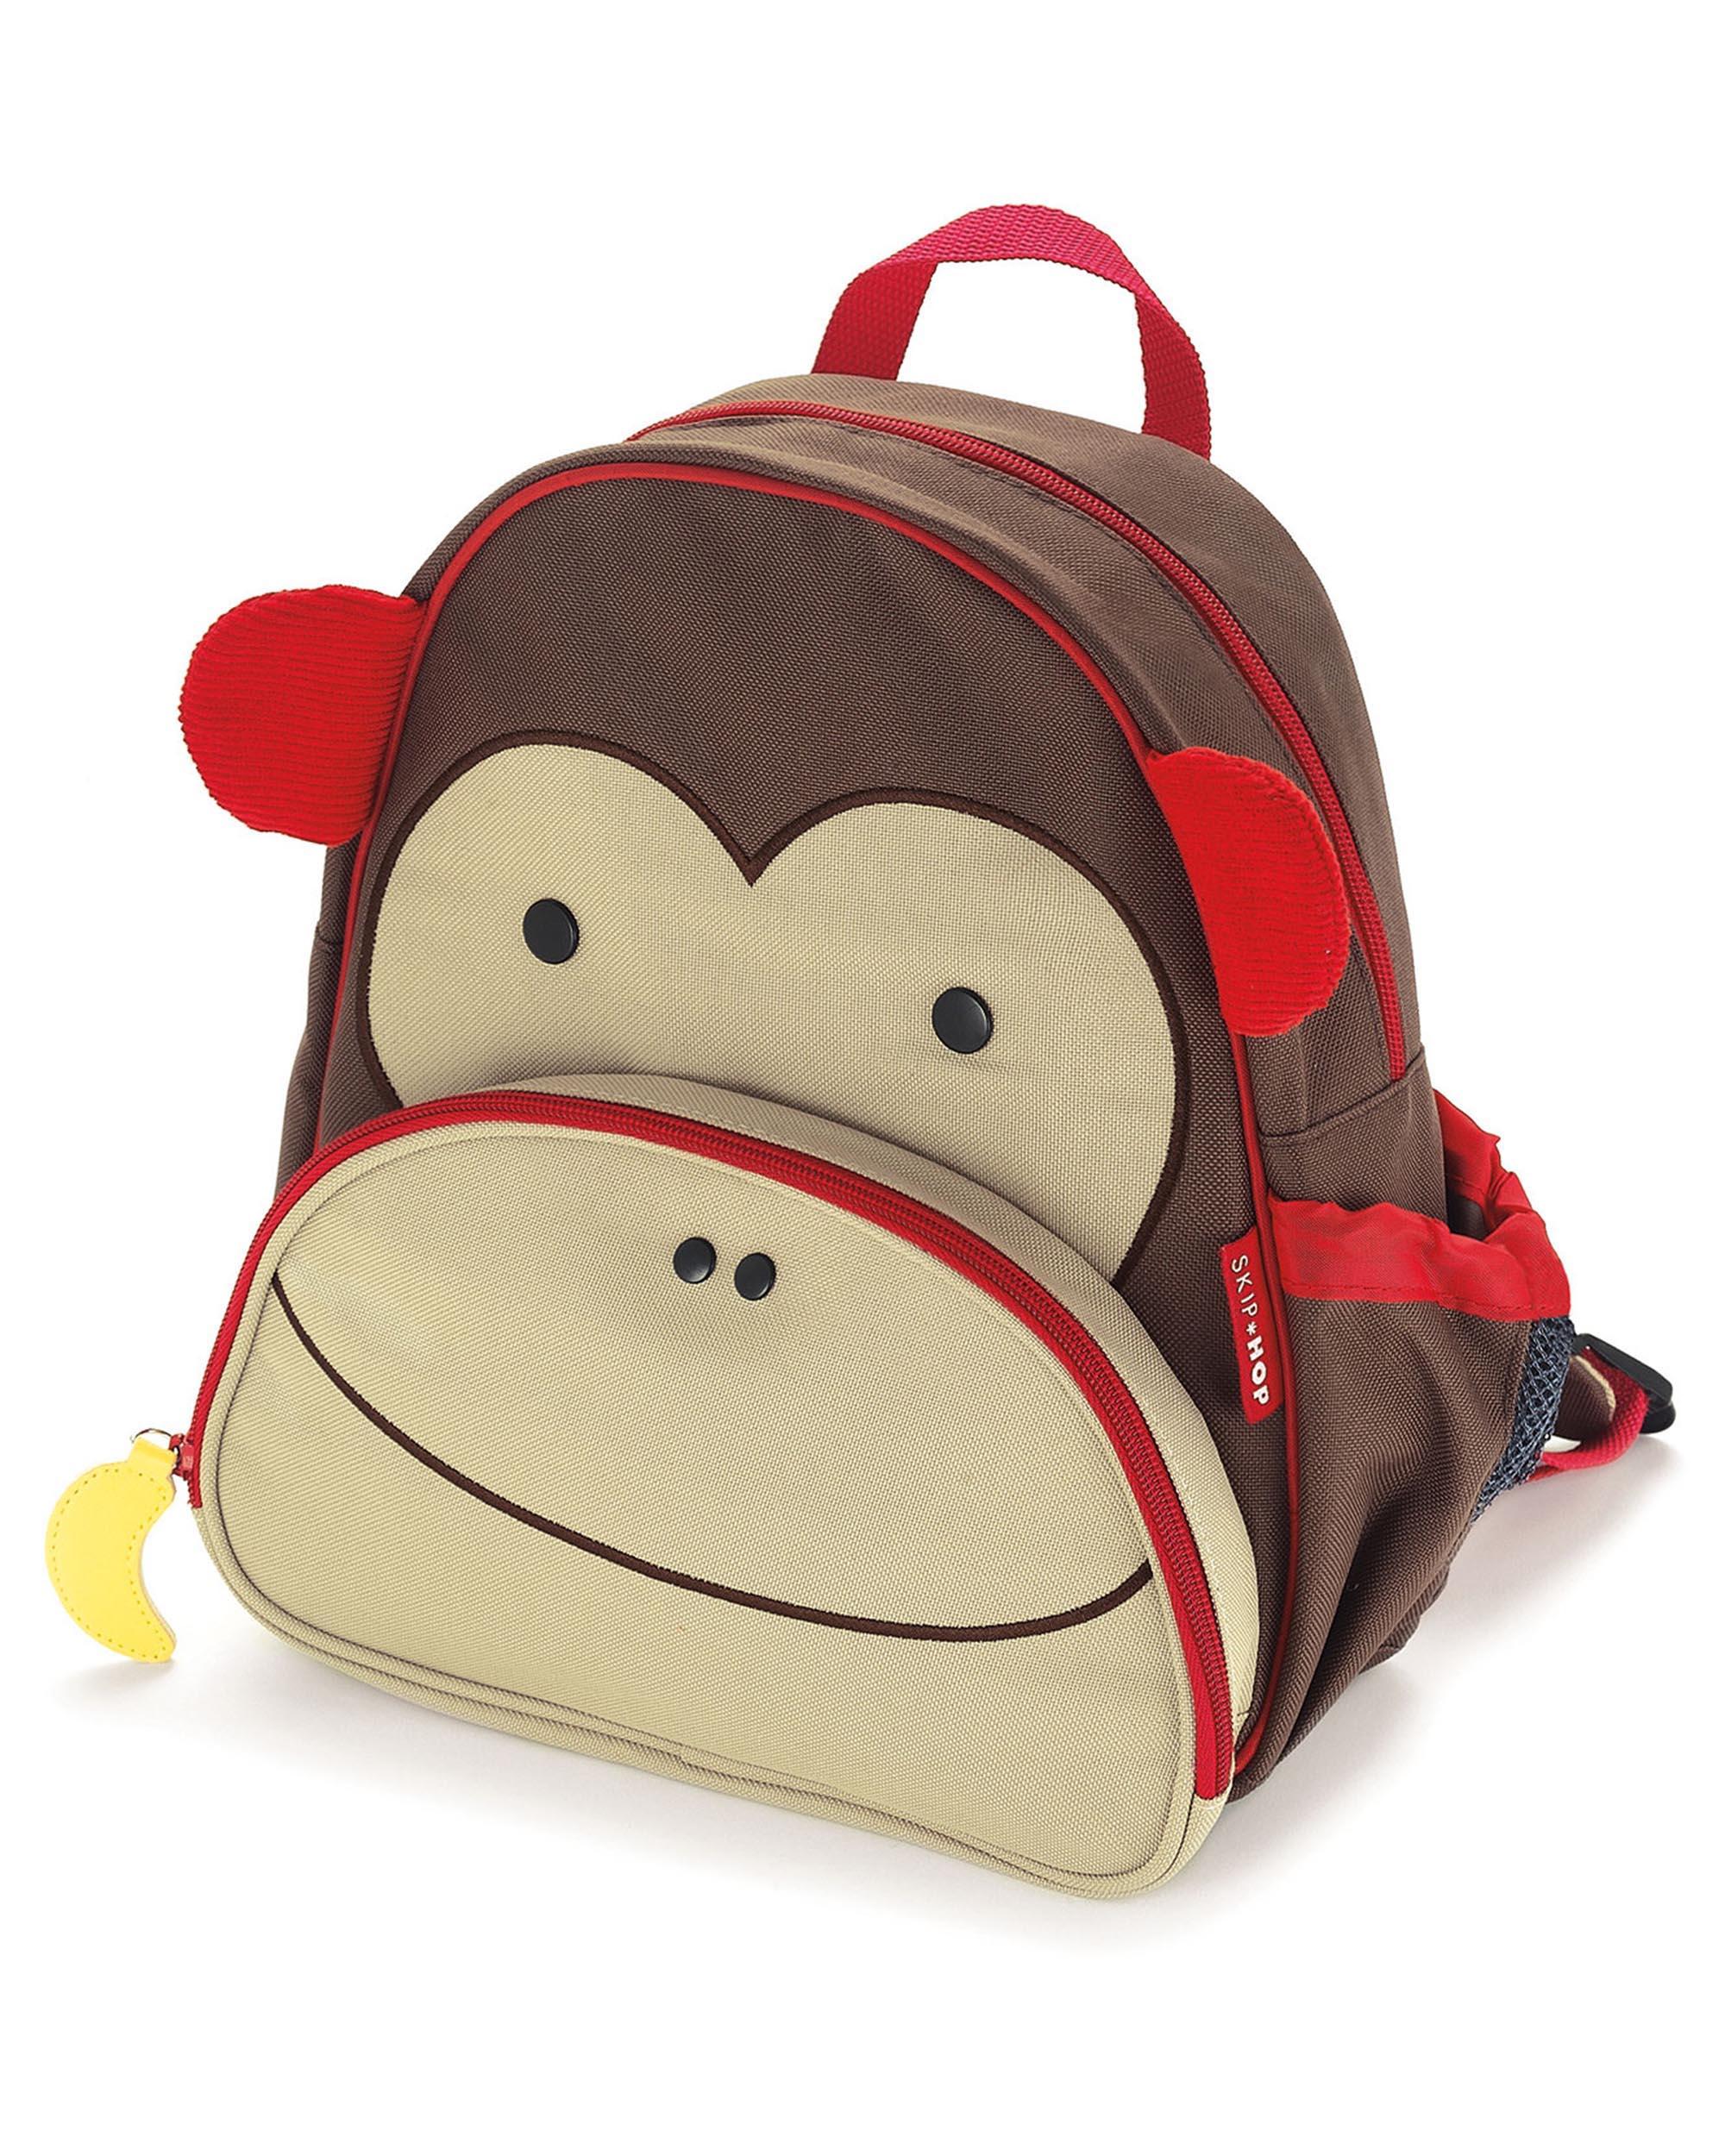 Zoo Little Kid Backpack   carters.com